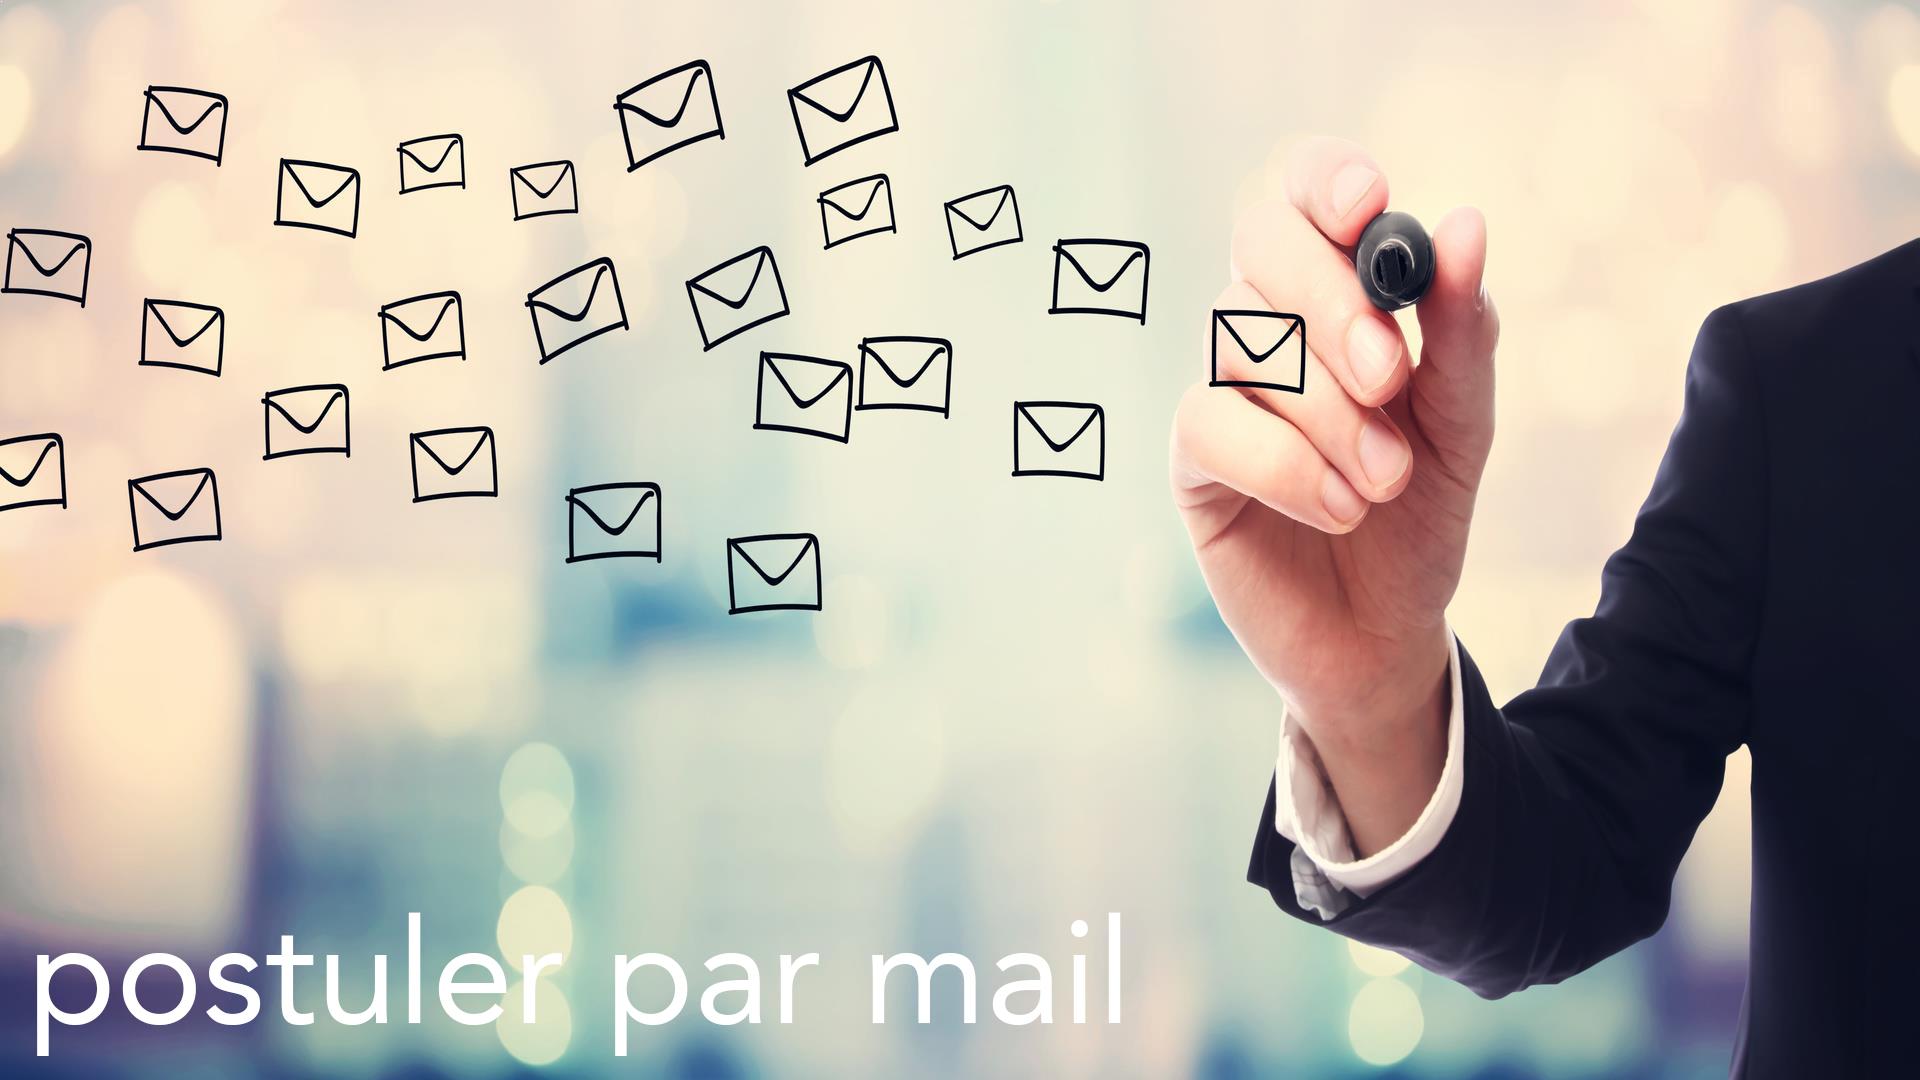 Postuler par e-mail : 6 conseils indispensables !